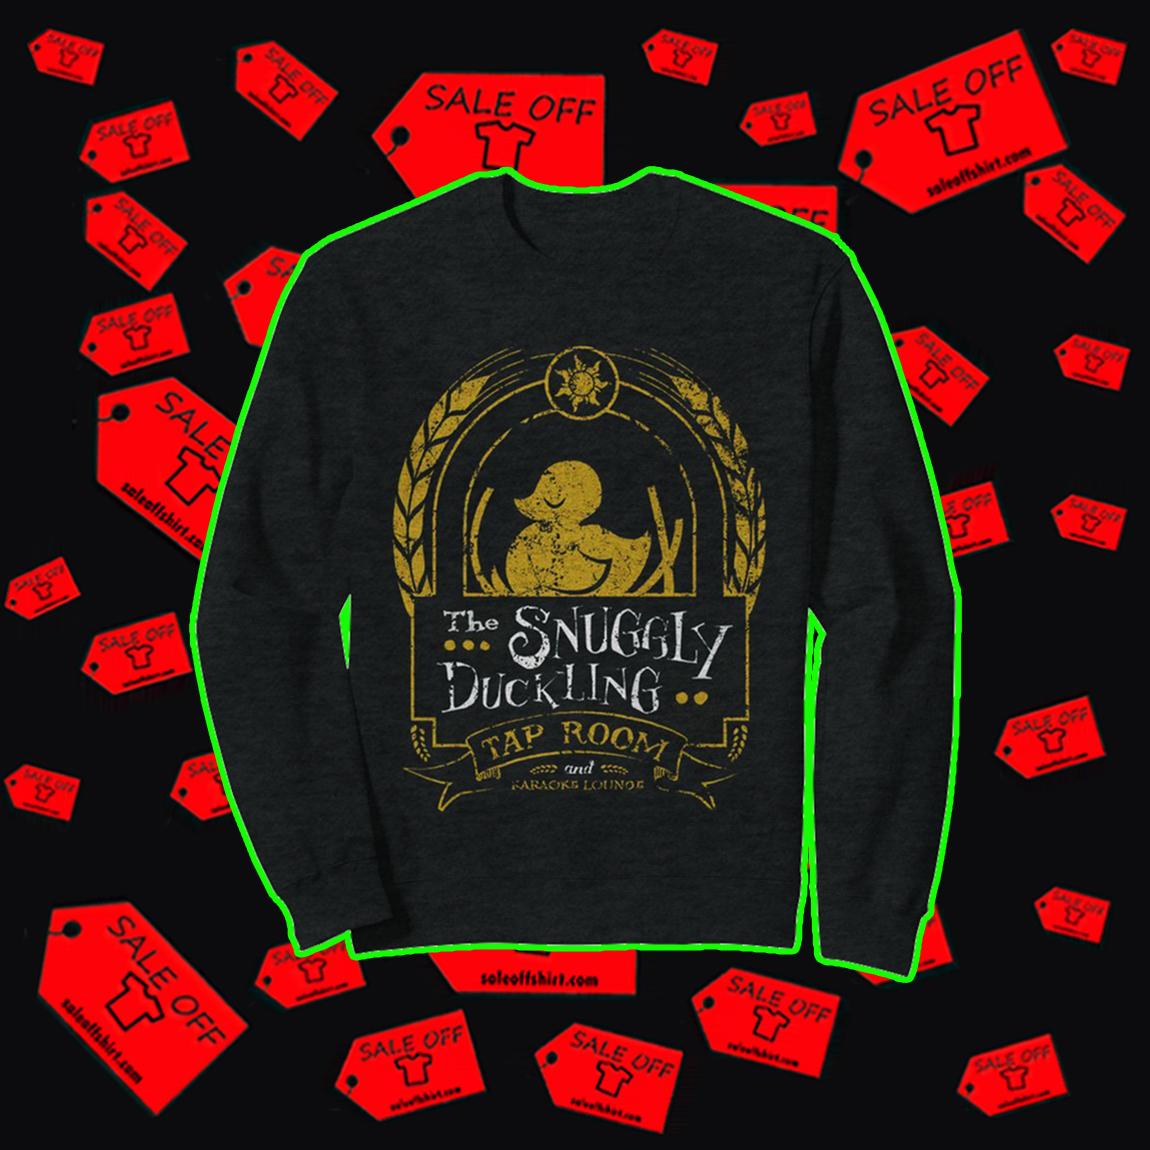 The Snuggly Duckling Tap Room sweatshirt